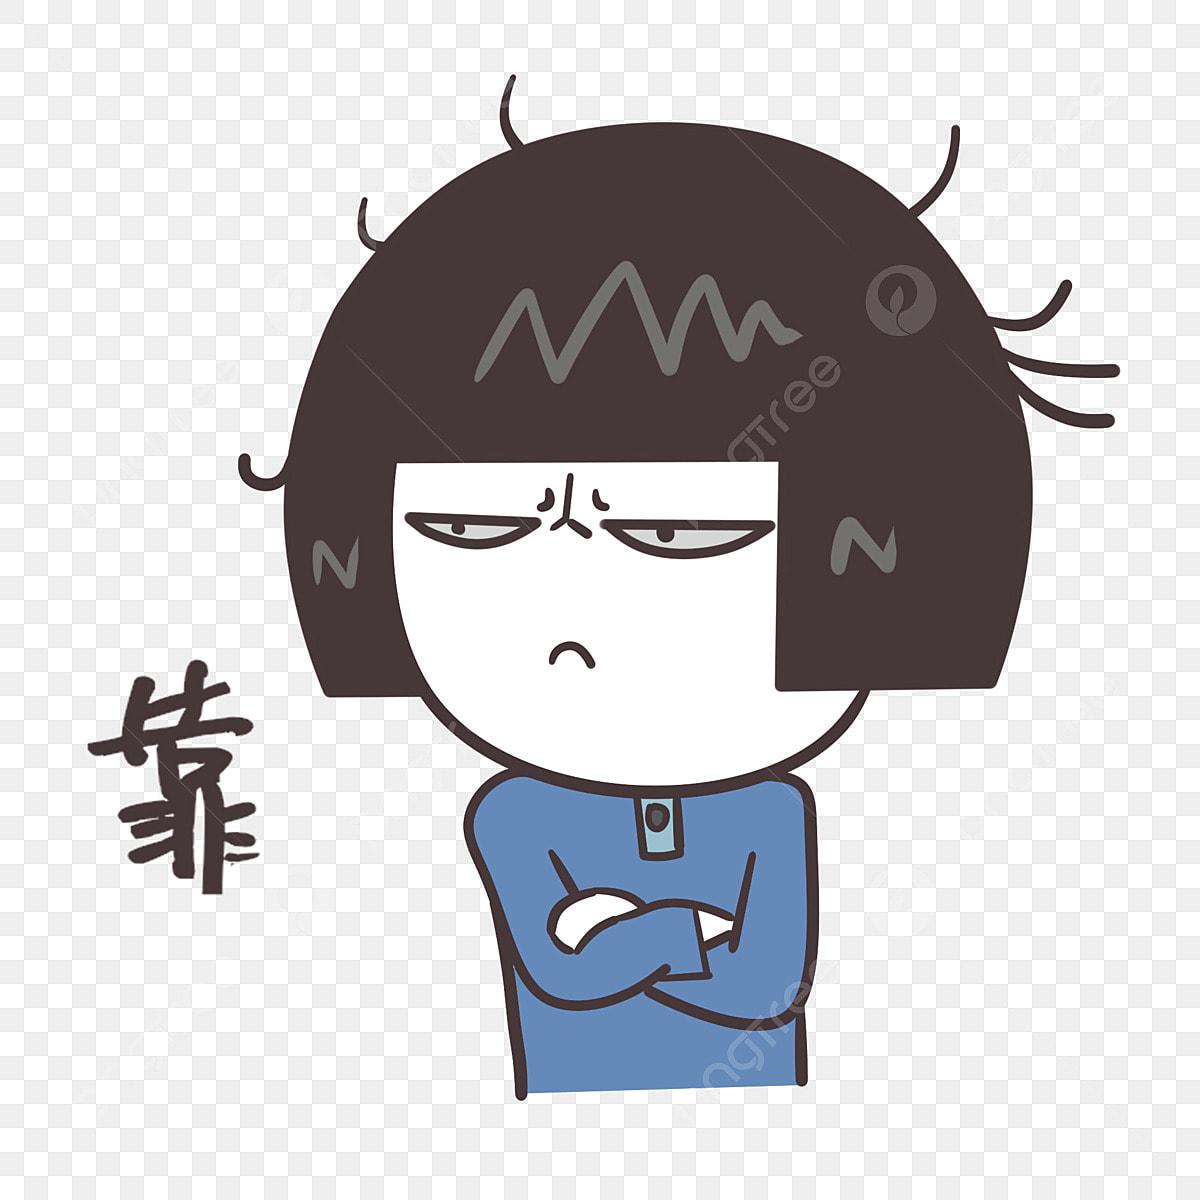 gambar ungkapan janggal ilustrasi kartun ekspresi muka ungkapan wajah ilustrasi pekak perasaan png dan psd untuk muat turun percuma https ms pngtree com freepng deaf cartoon illustration 4583423 html